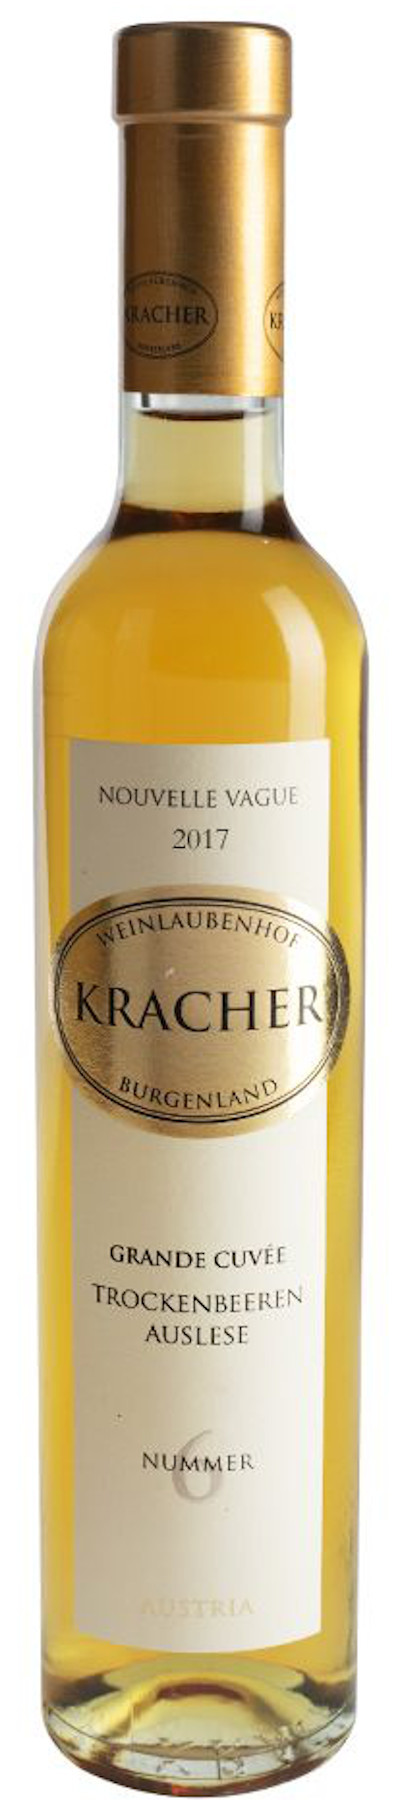 Kracher - Trockenbeerenauslese Grande Cuvée Nr.6 Nouvelle Vague